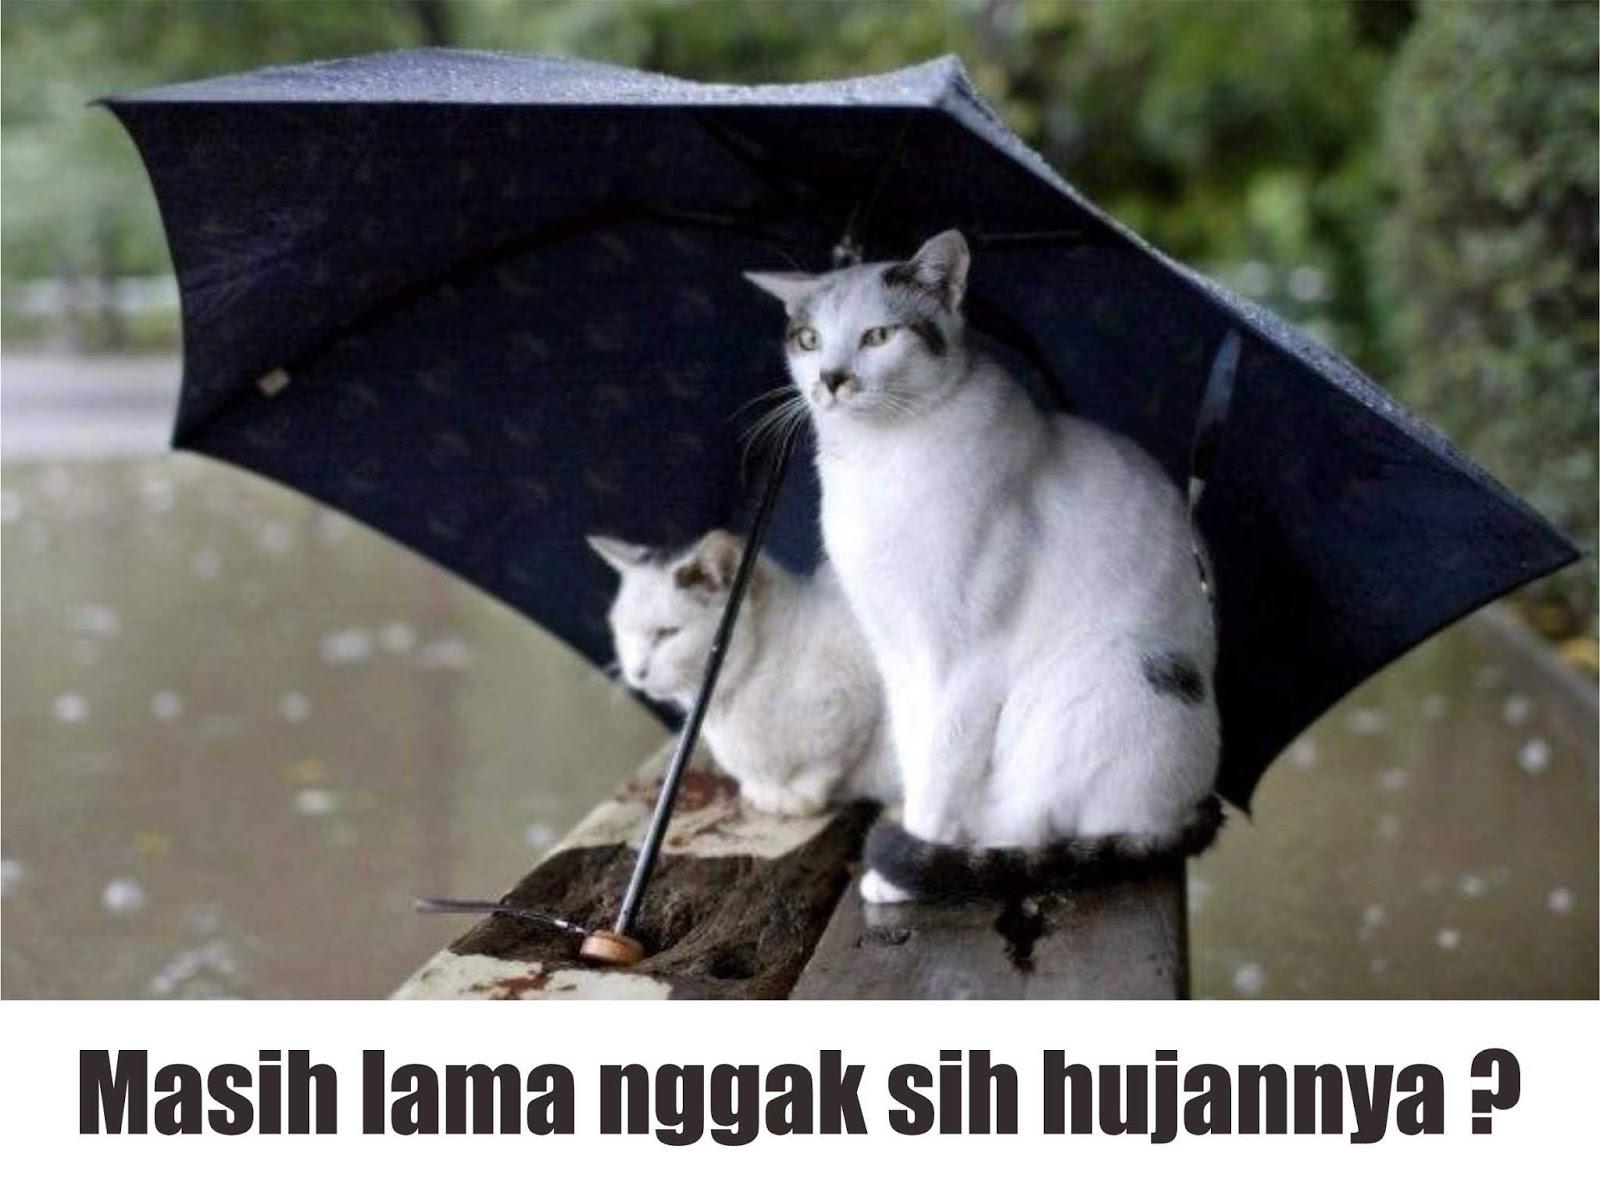 25 Meme Hujan Lucu Terbaru Paling Gokil Dan Kocak Gambar